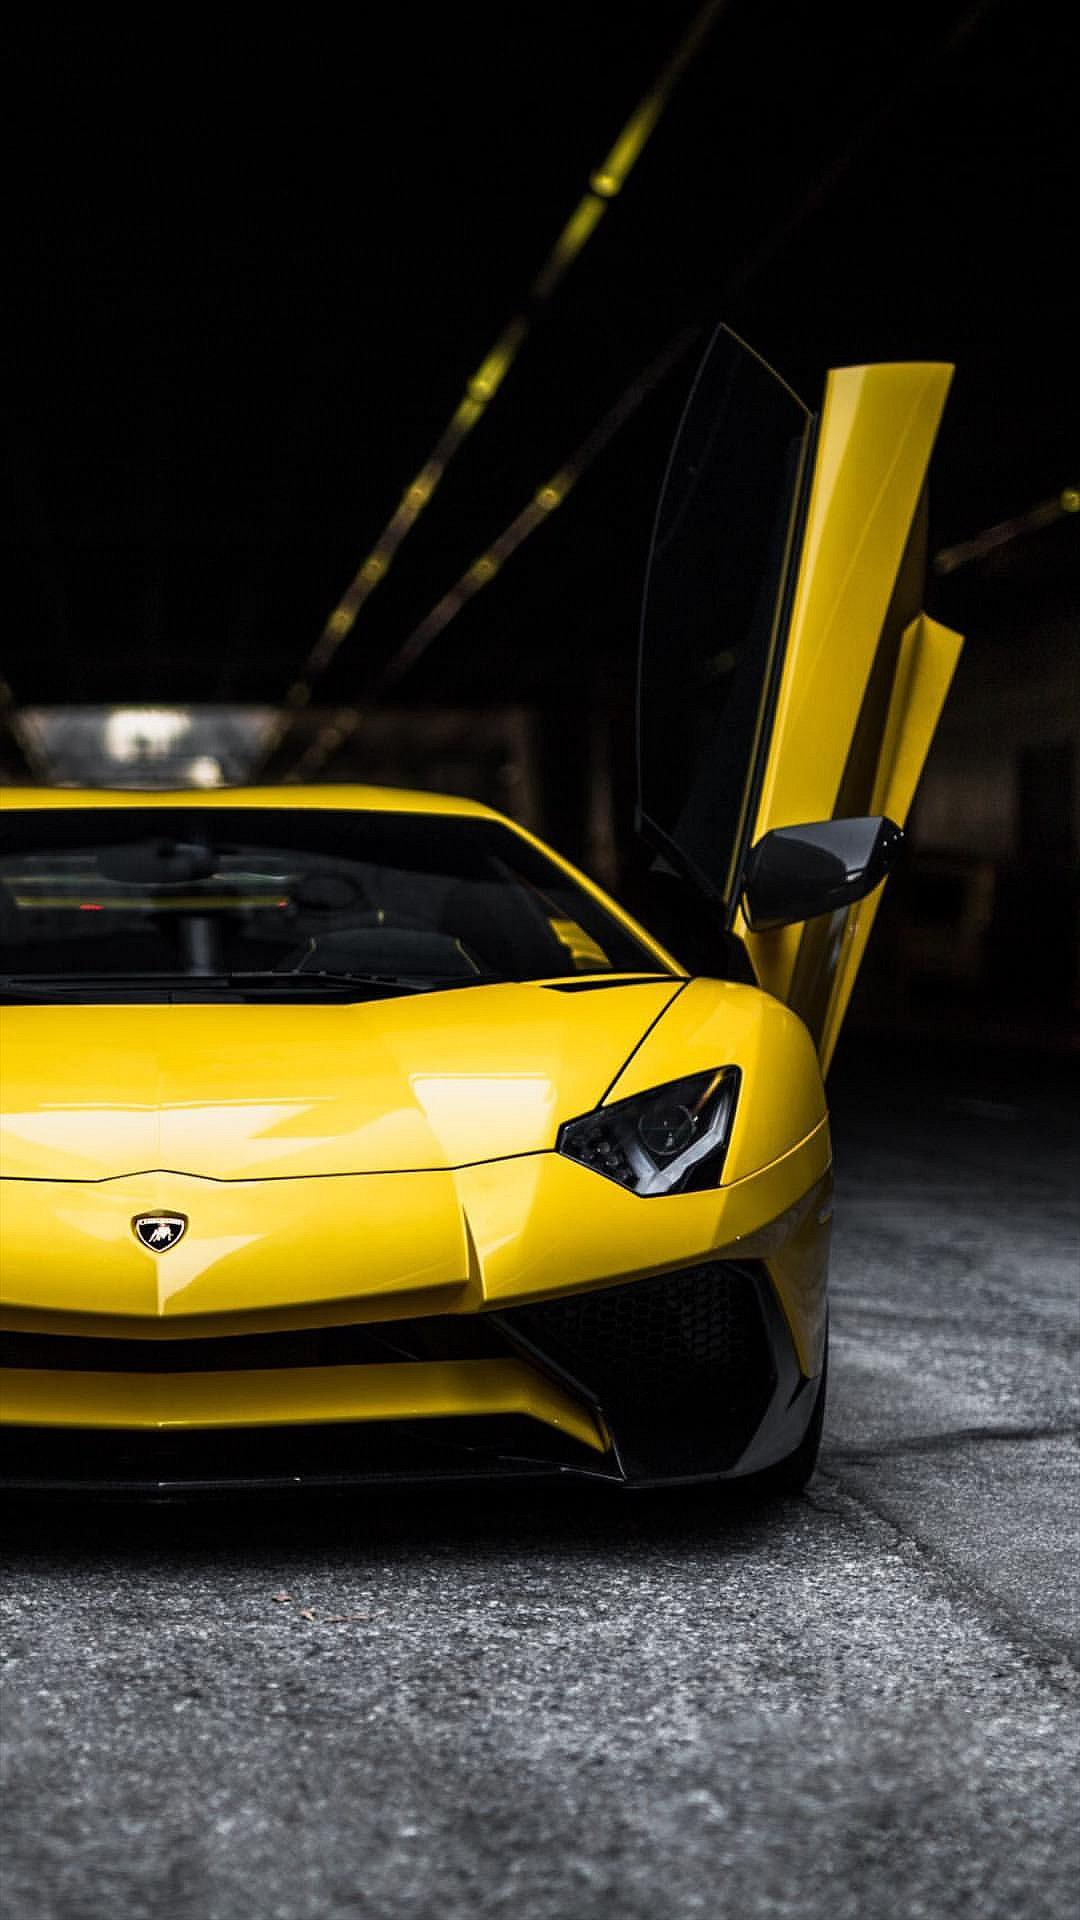 Lamborghini Cell screen wallpaper